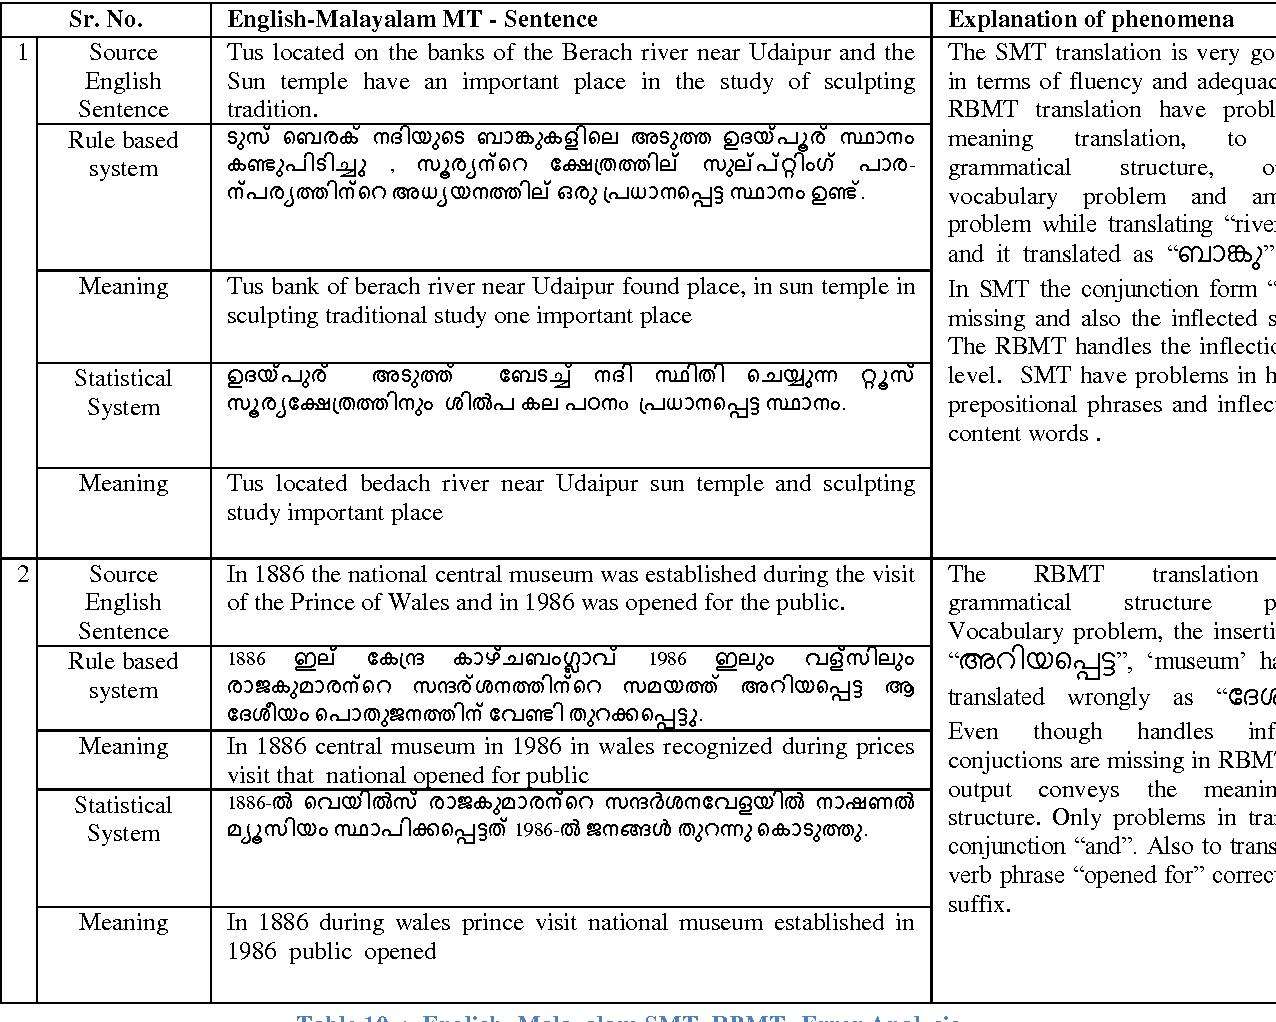 Table 10 from A case study on English-Malayalam Machine